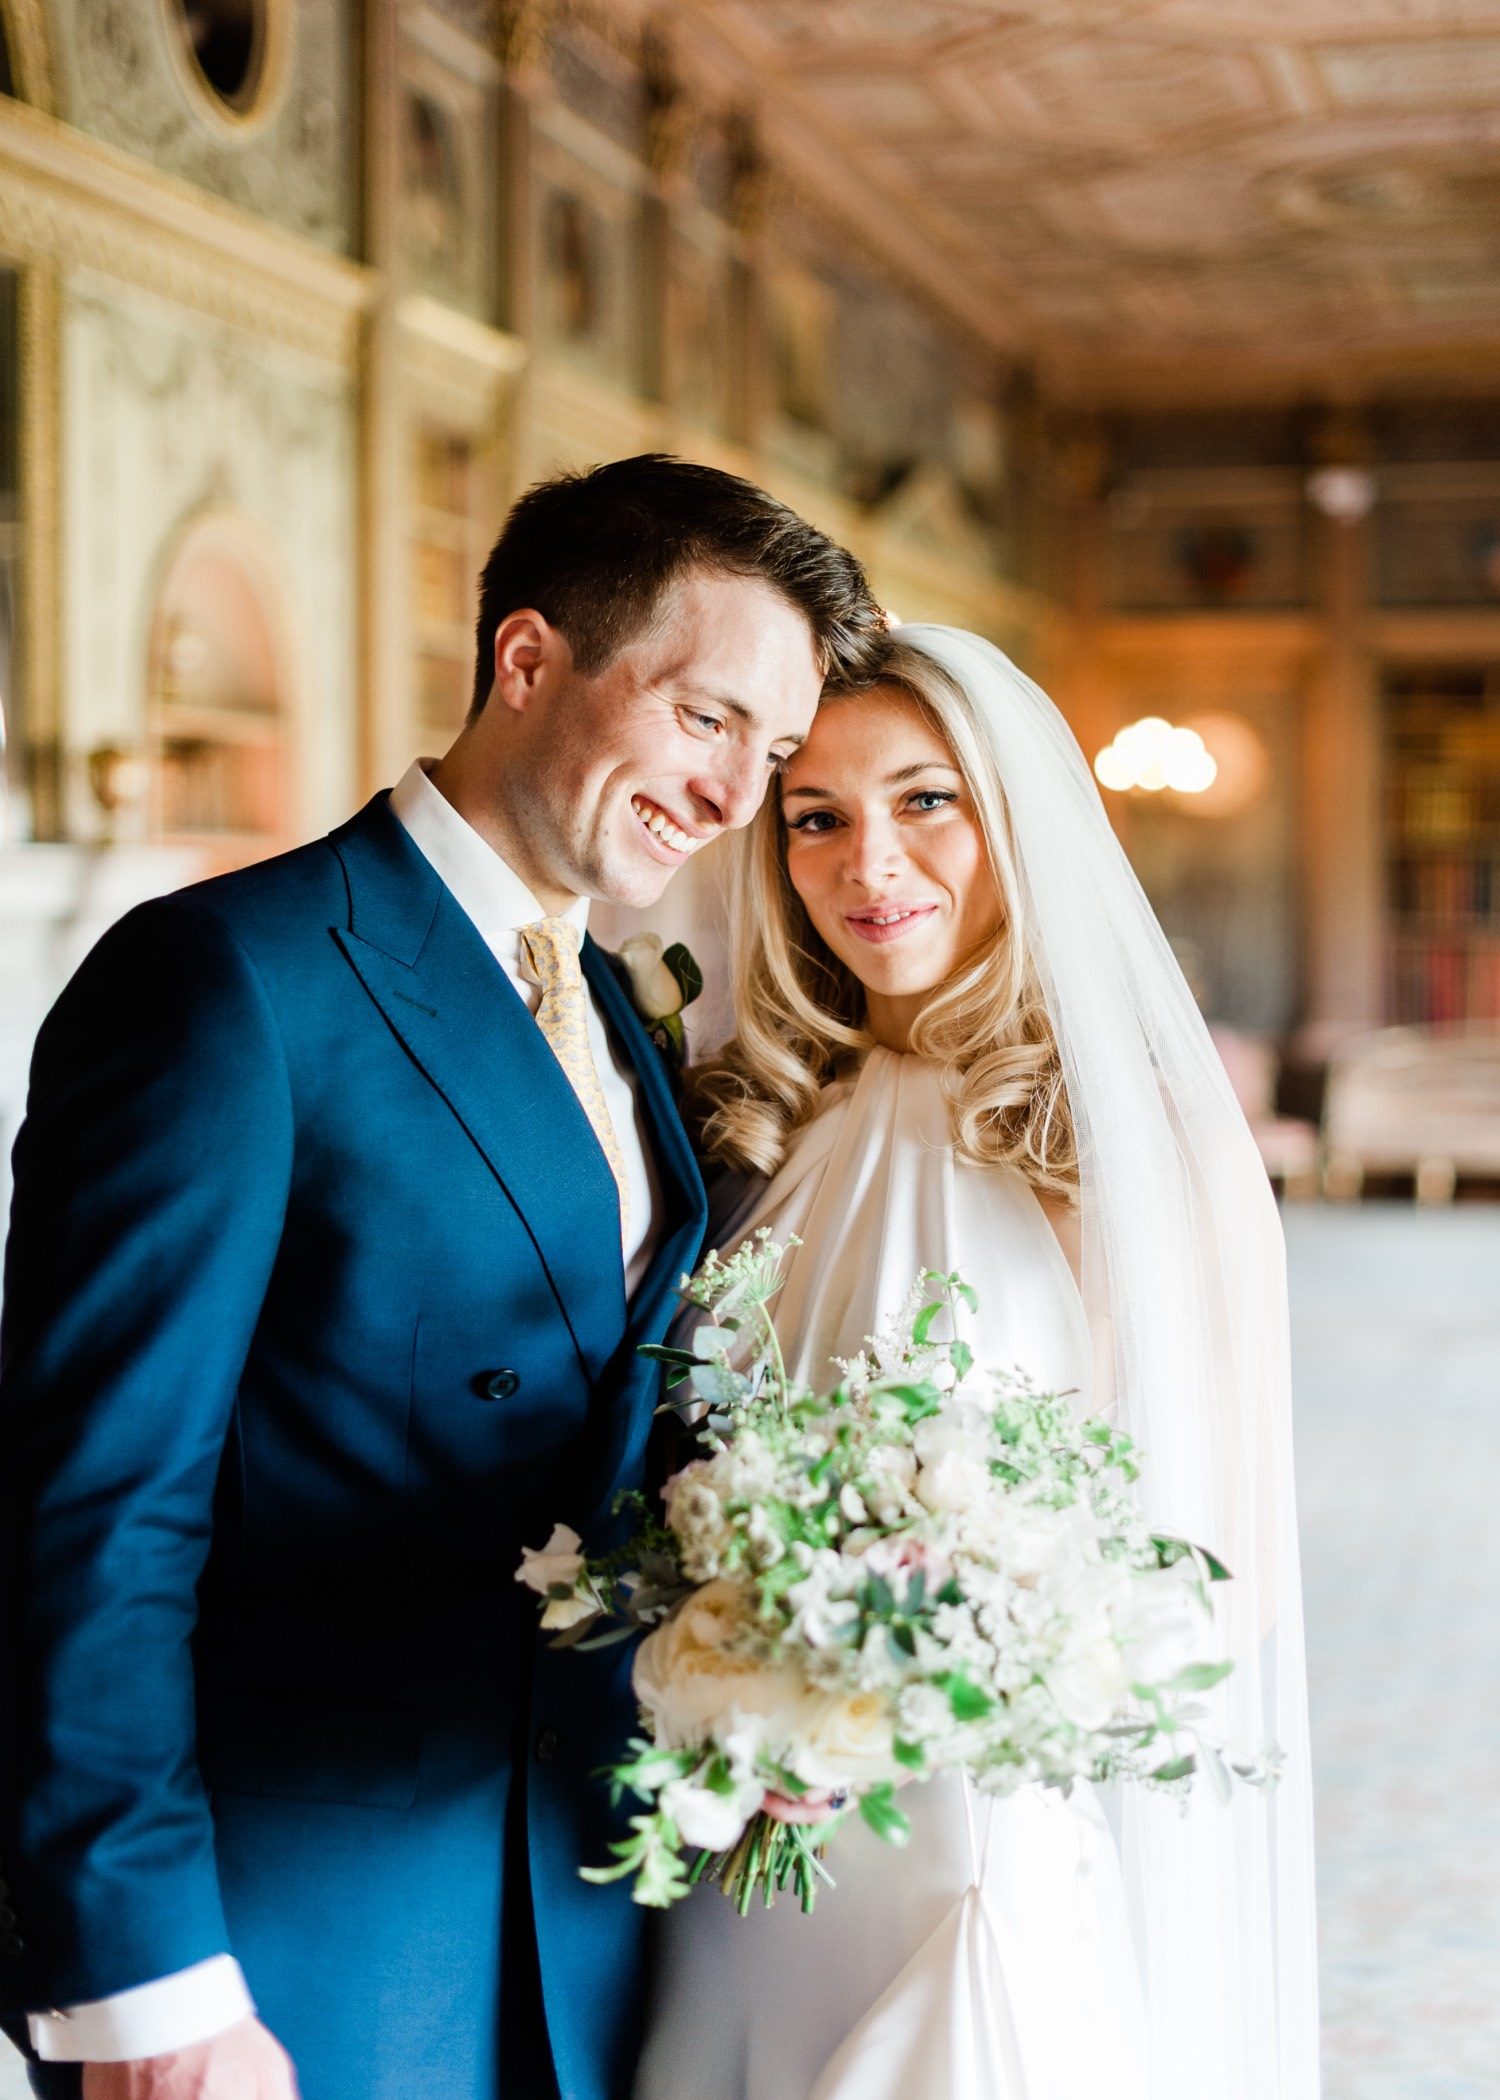 Littleton-Rose-Syon-House-London-Wedding-Planner-Bride-and-Groom-bouquet.jpg